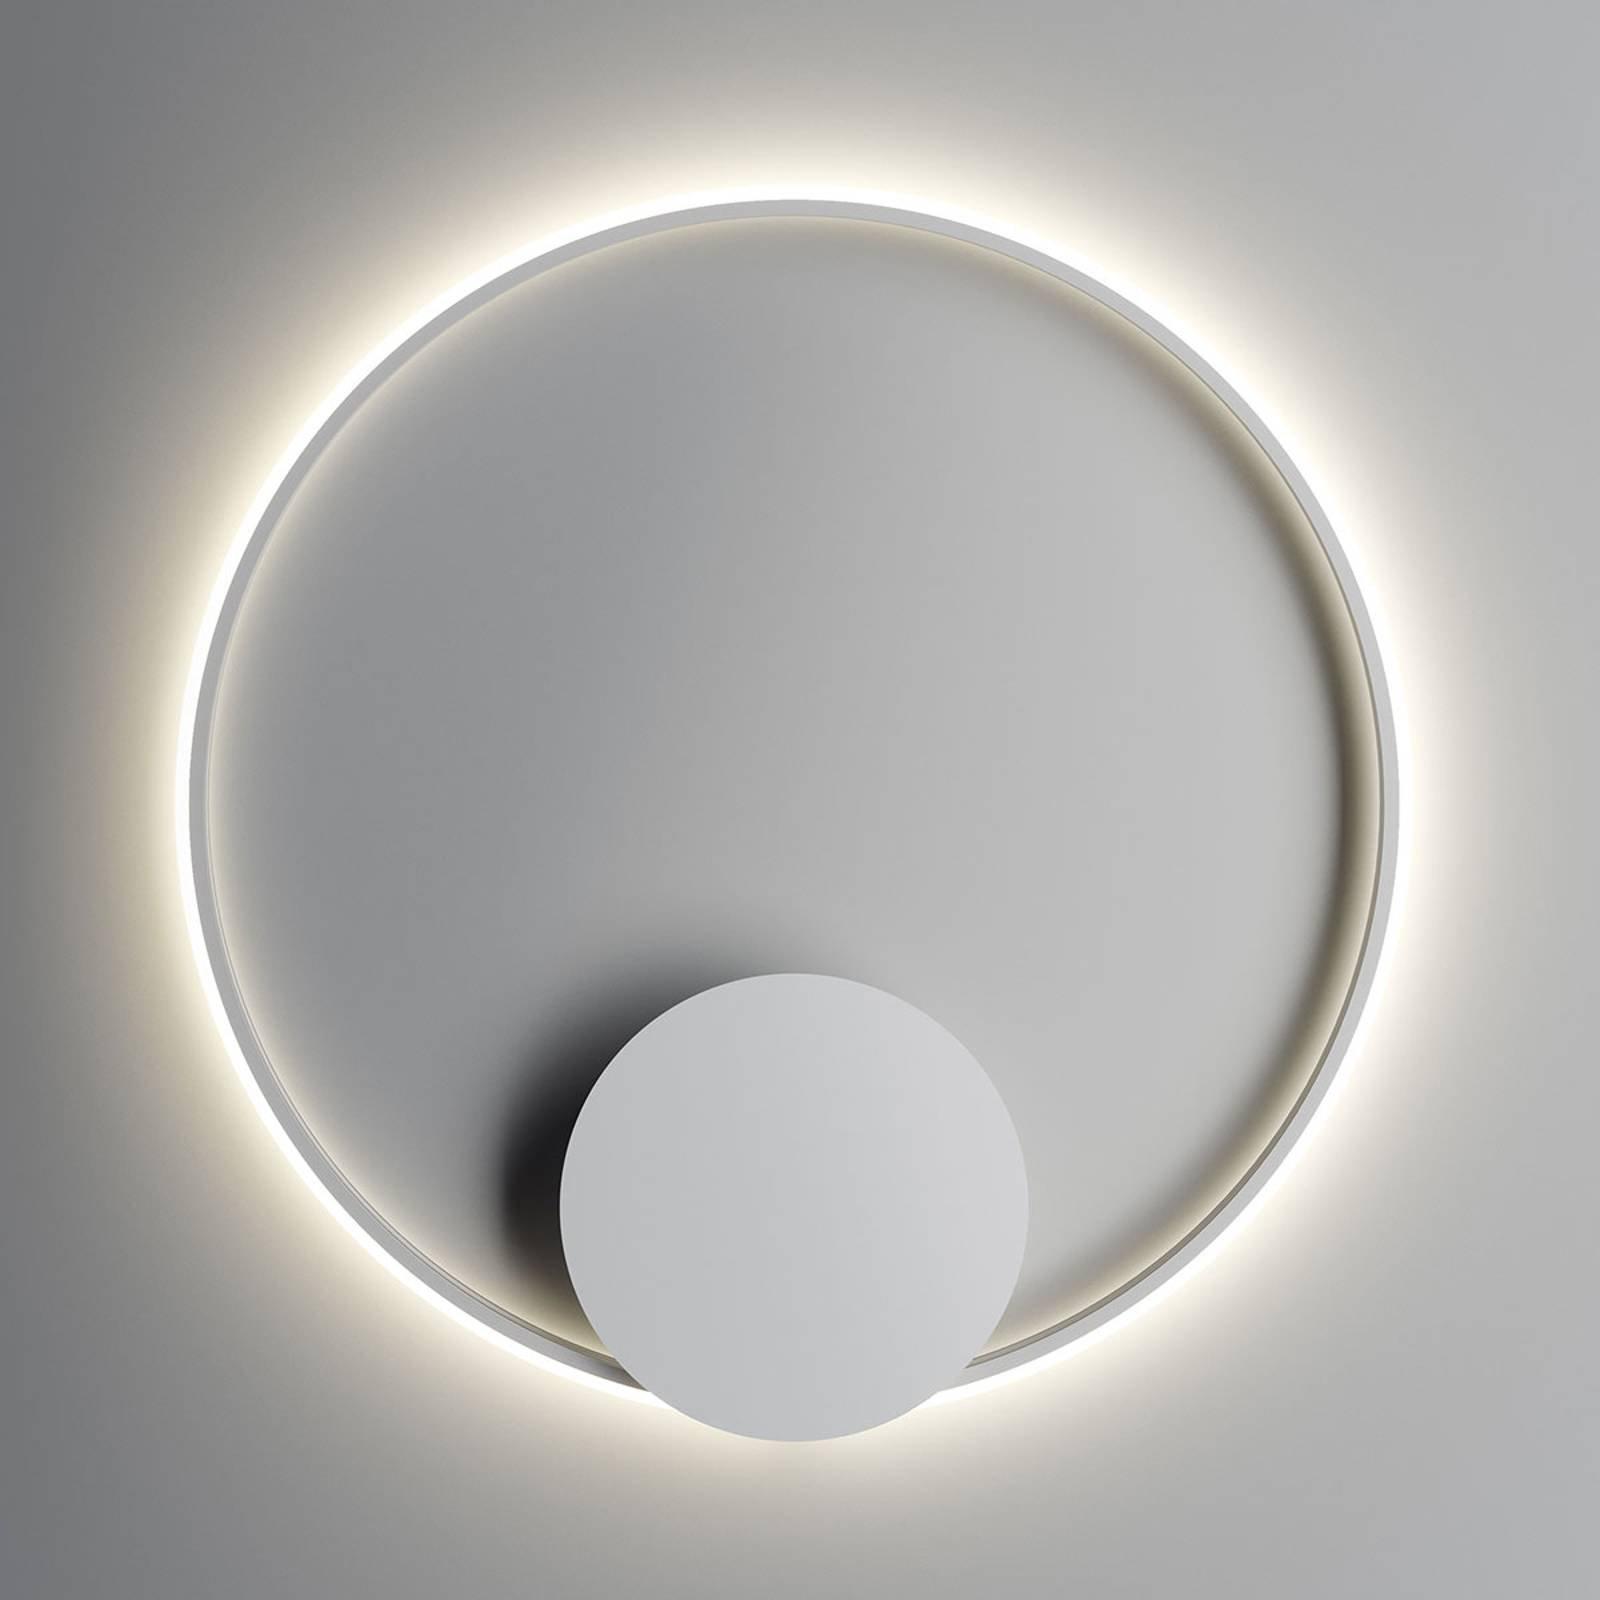 Fabbian Olympic LED-vegglampe 80 cm, hvit